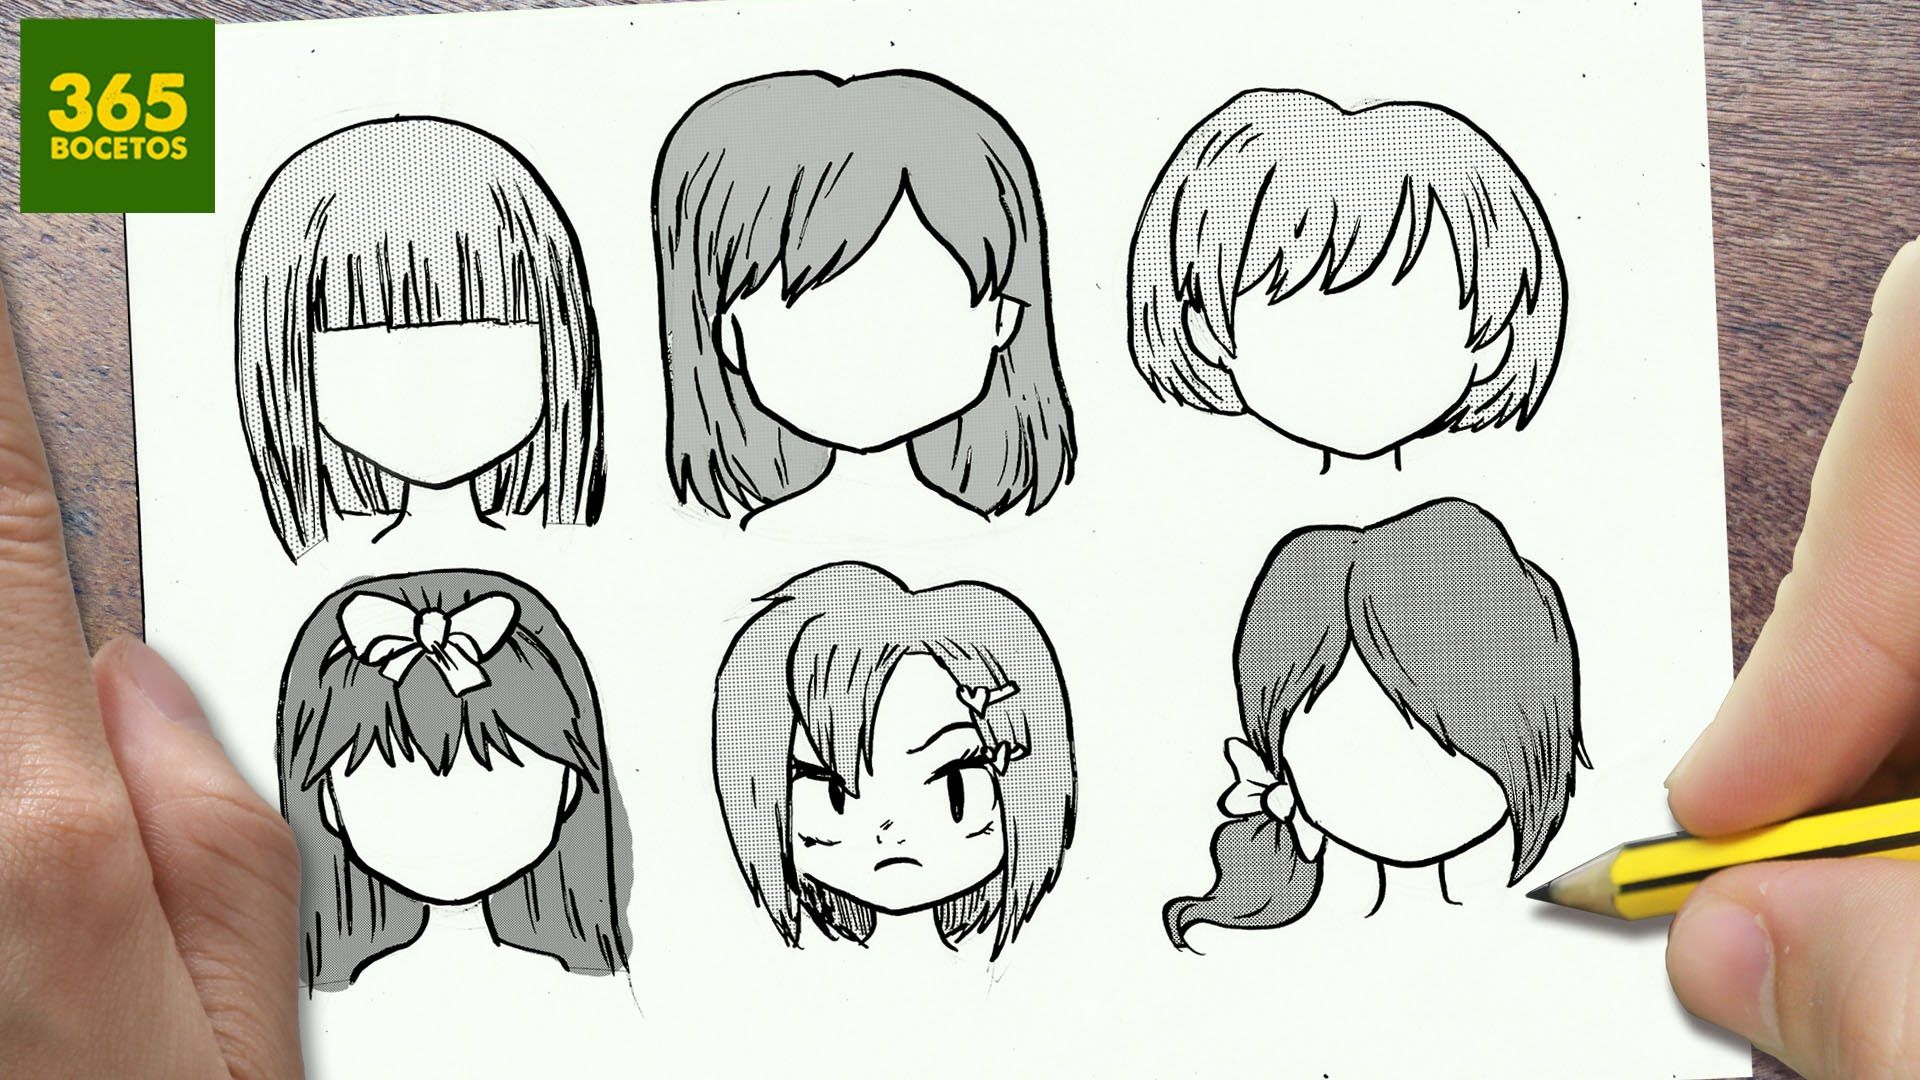 COMO DIBUJAR CABELLO ANIME   COMO DIBUJAR CABELLO MANGA - How to draw hair d93e8c700380